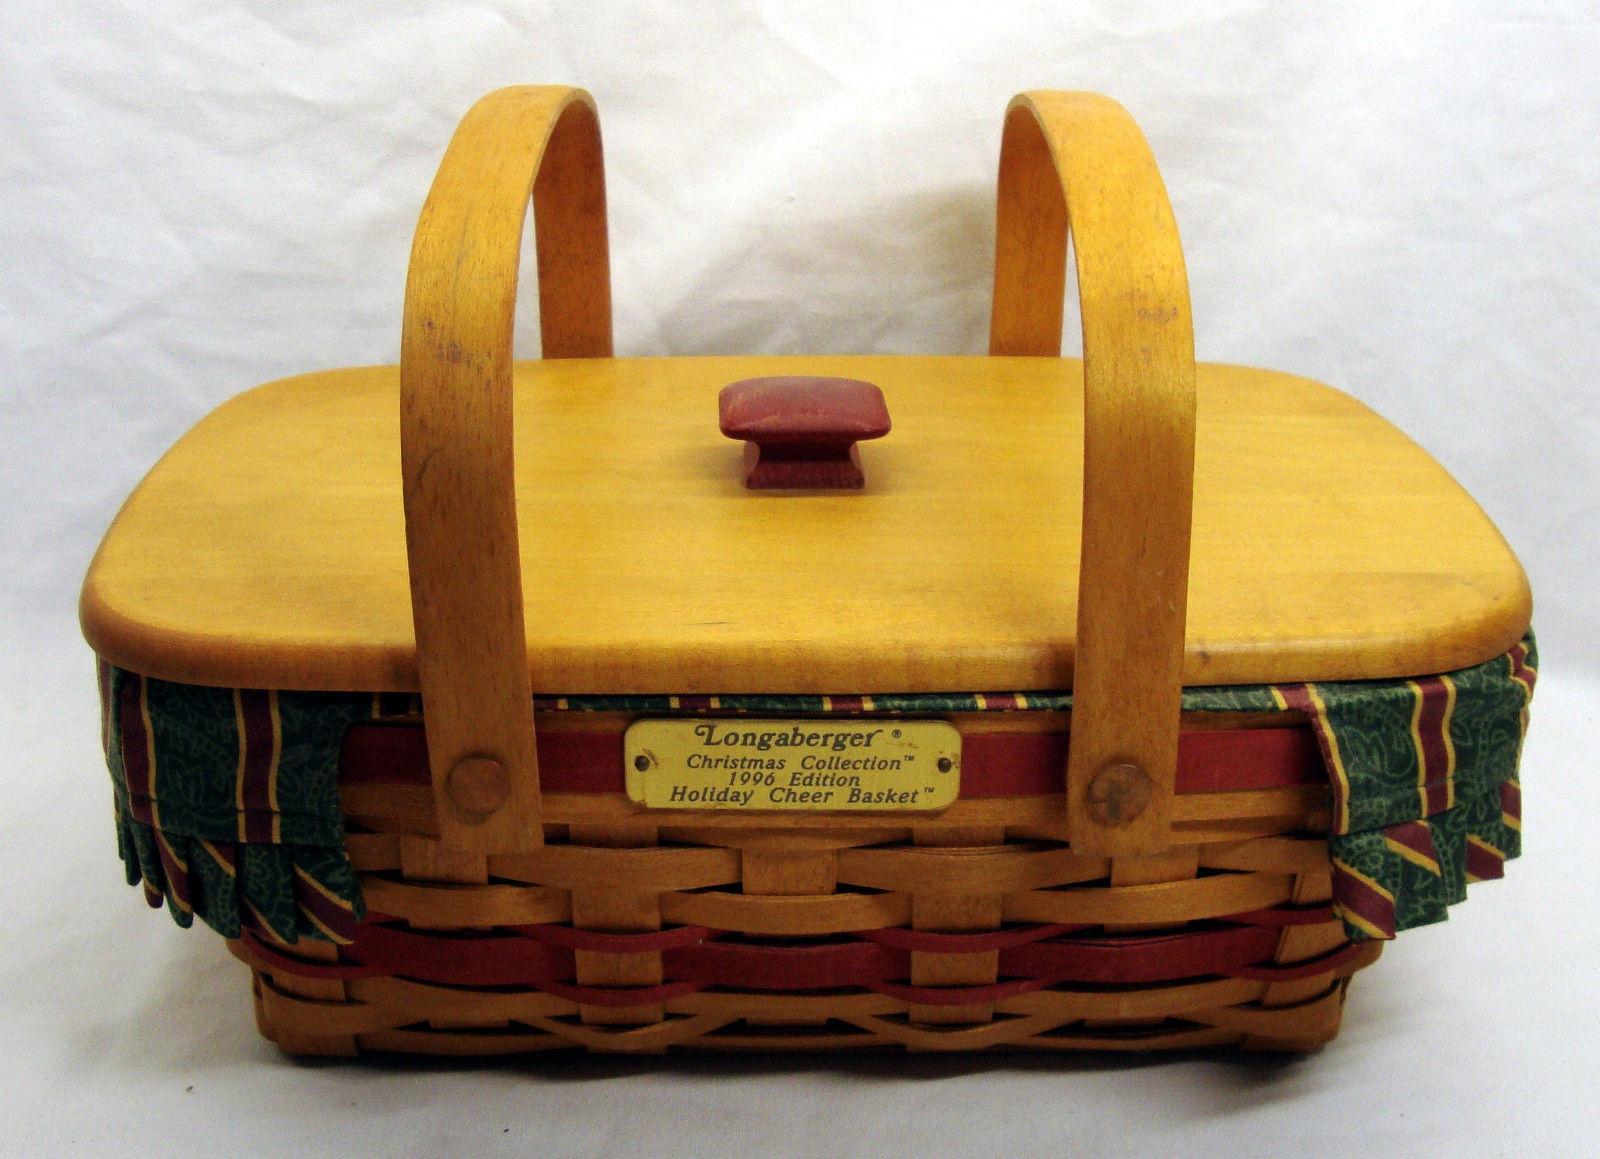 Longaberger Christmas Basket.1996 Longaberger Christmas Collection And 50 Similar Items